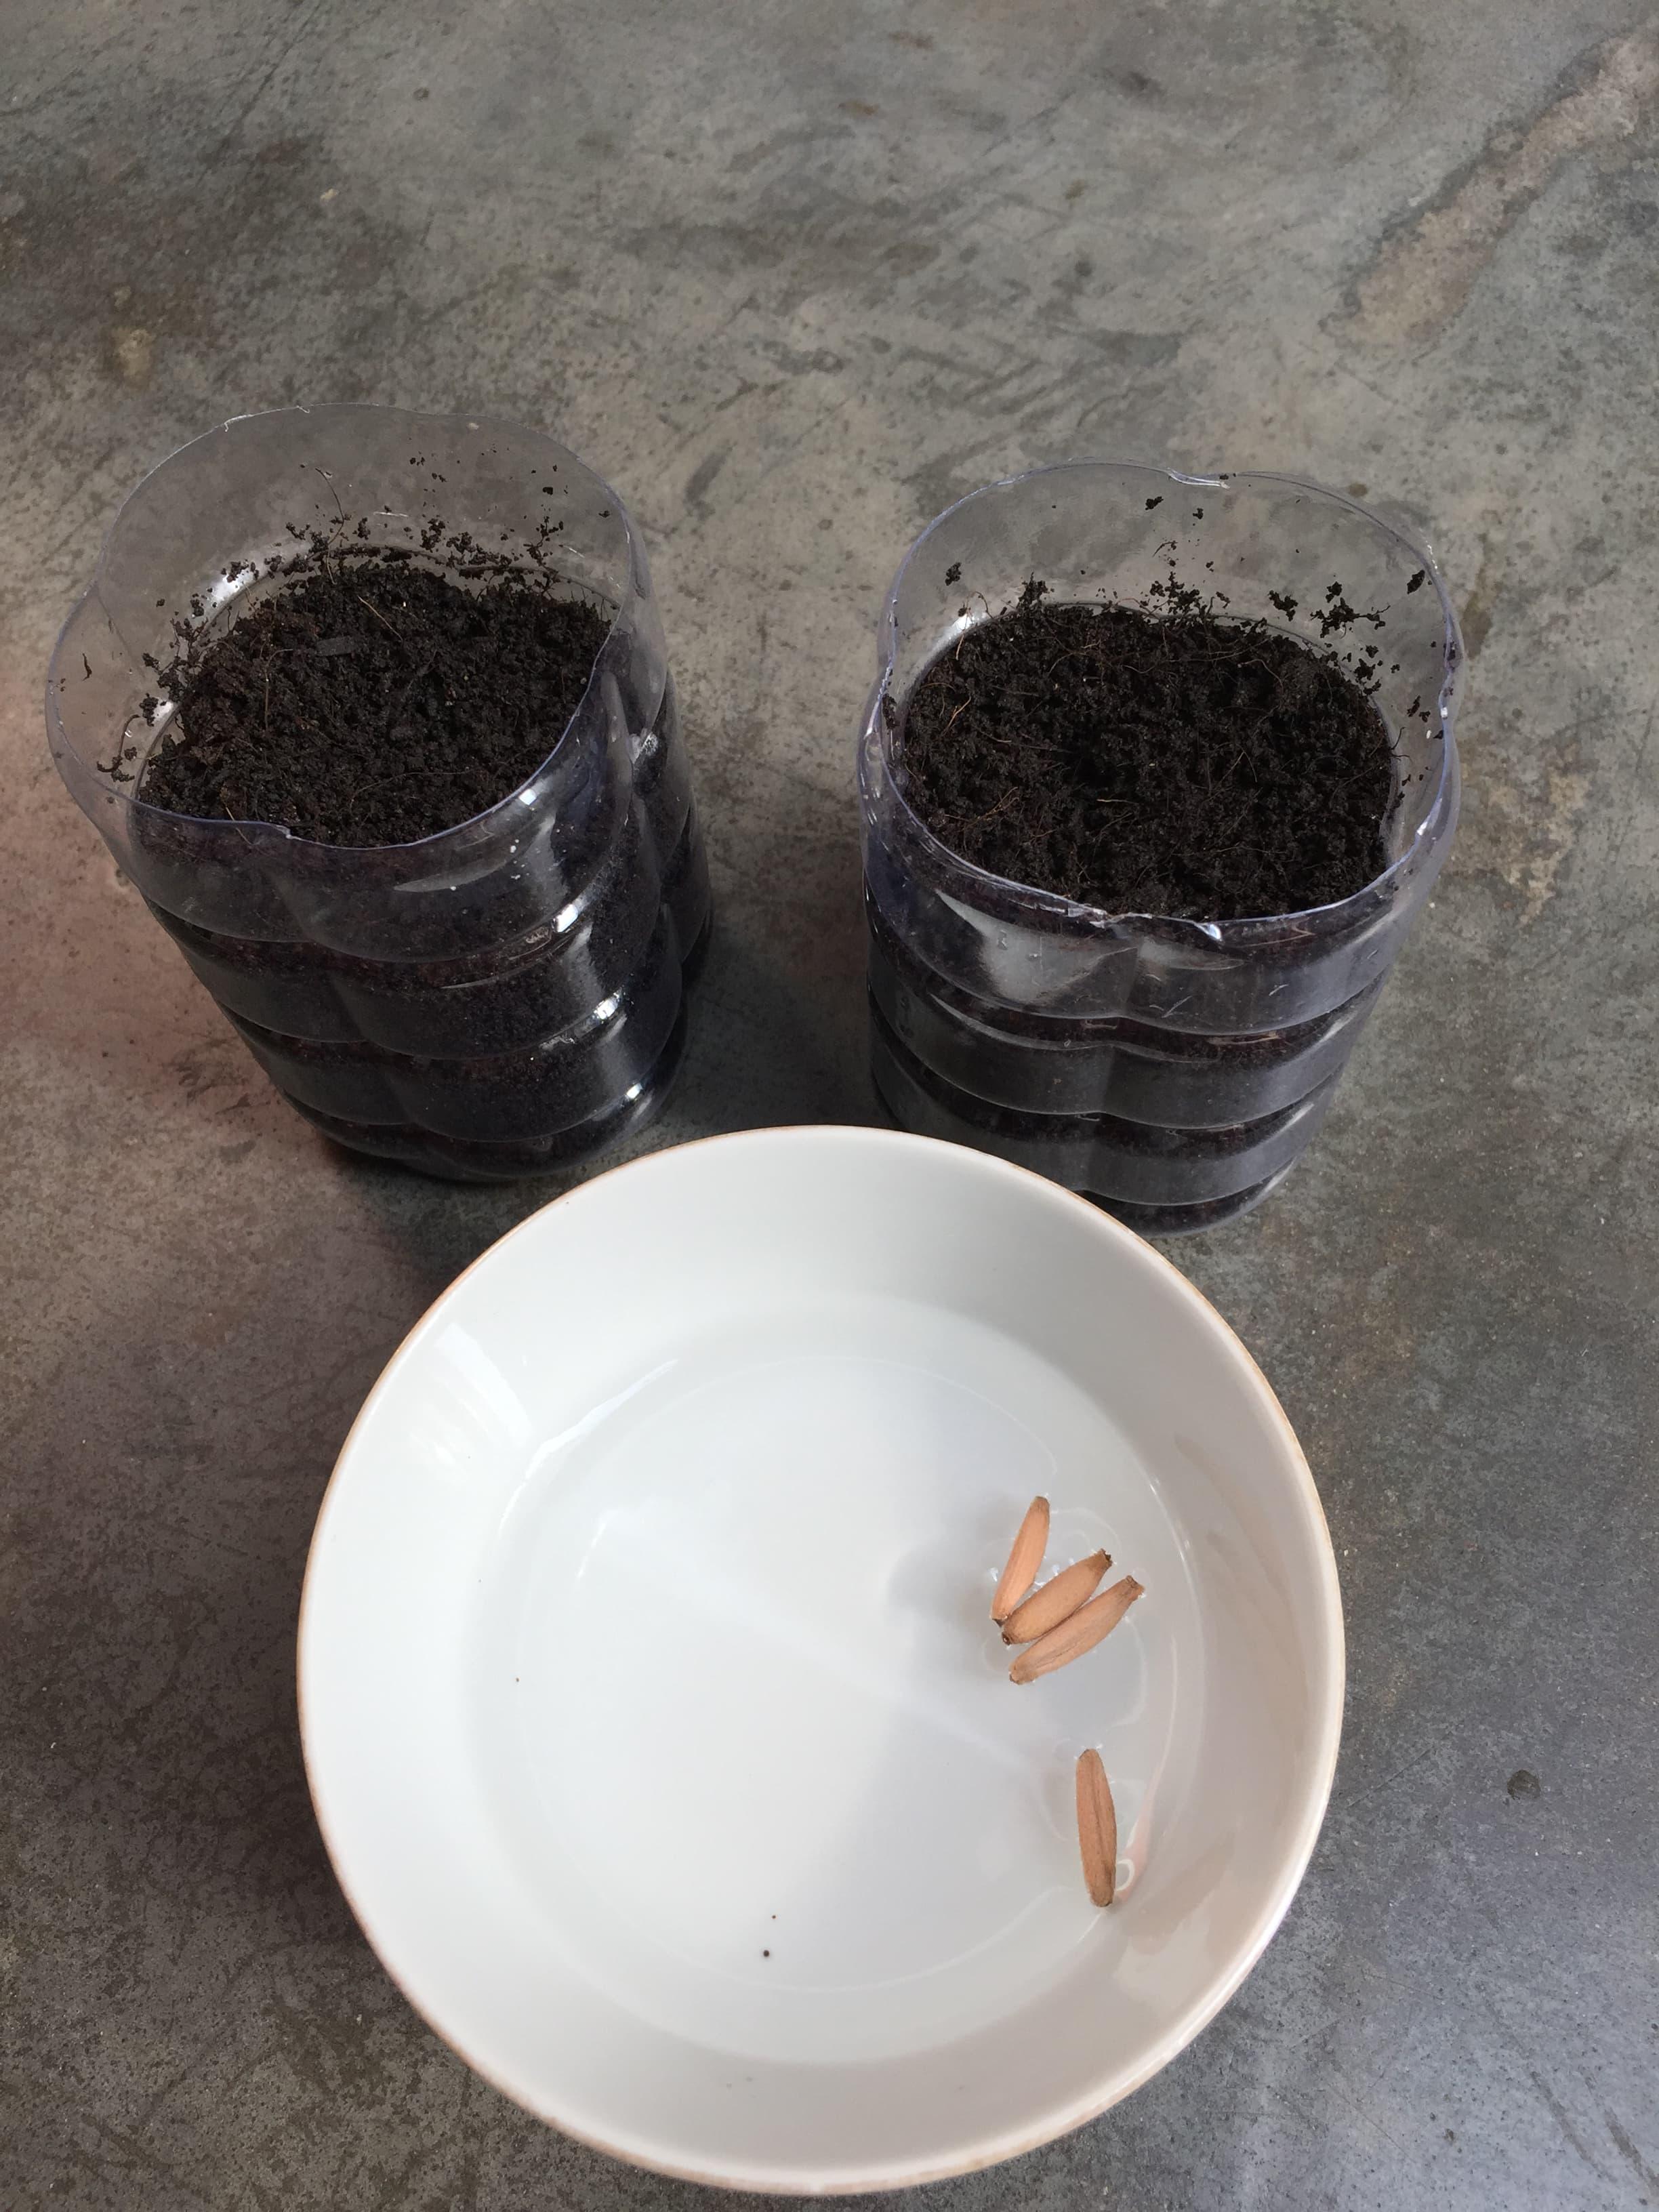 Soak adenium seeds in water